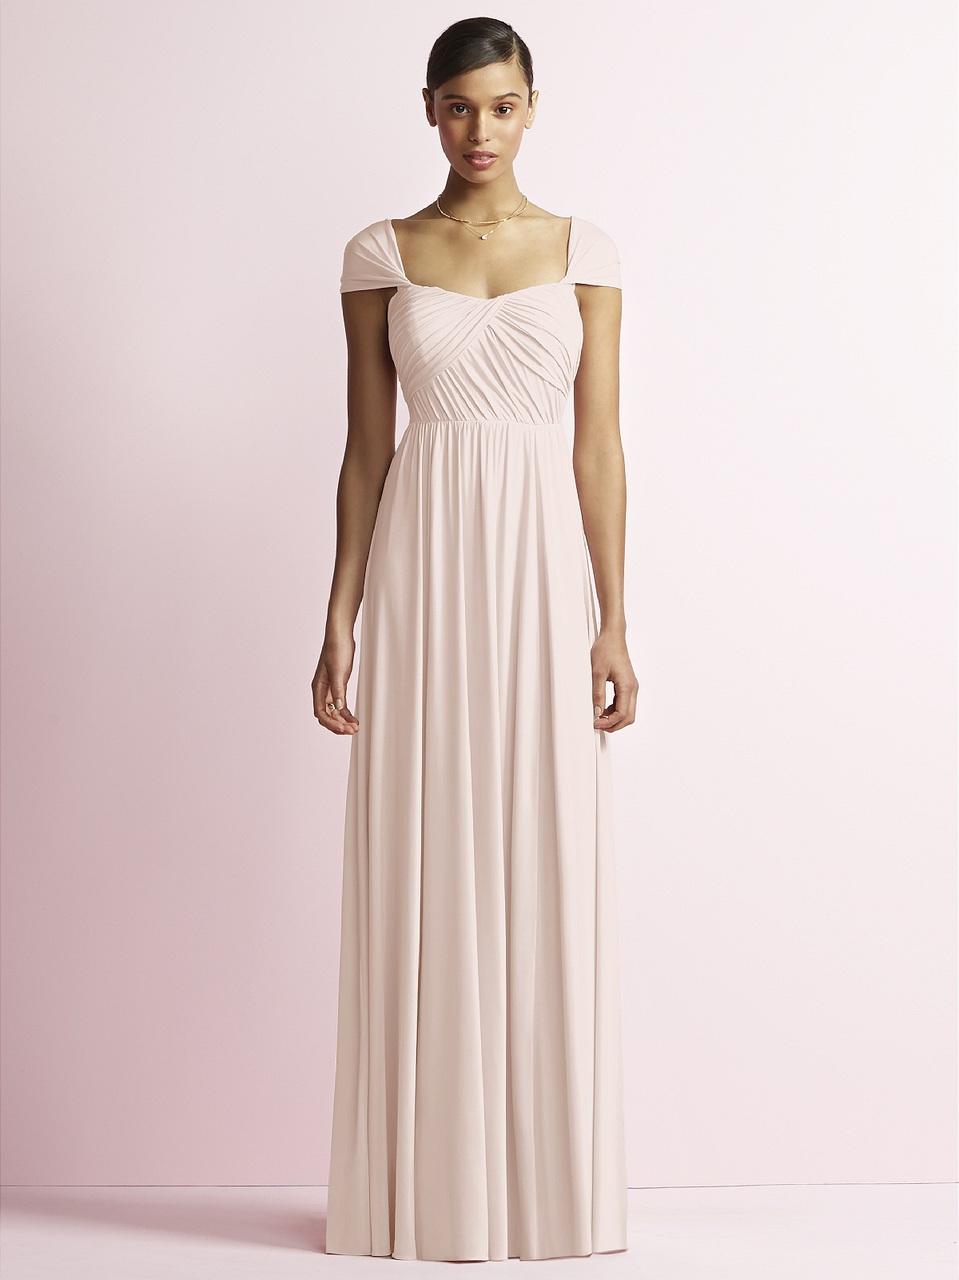 5e93fc6005b8e JY Jenny Yoo Bridesmaid Dress Style JY504 | Bridesmaids Dresses Online